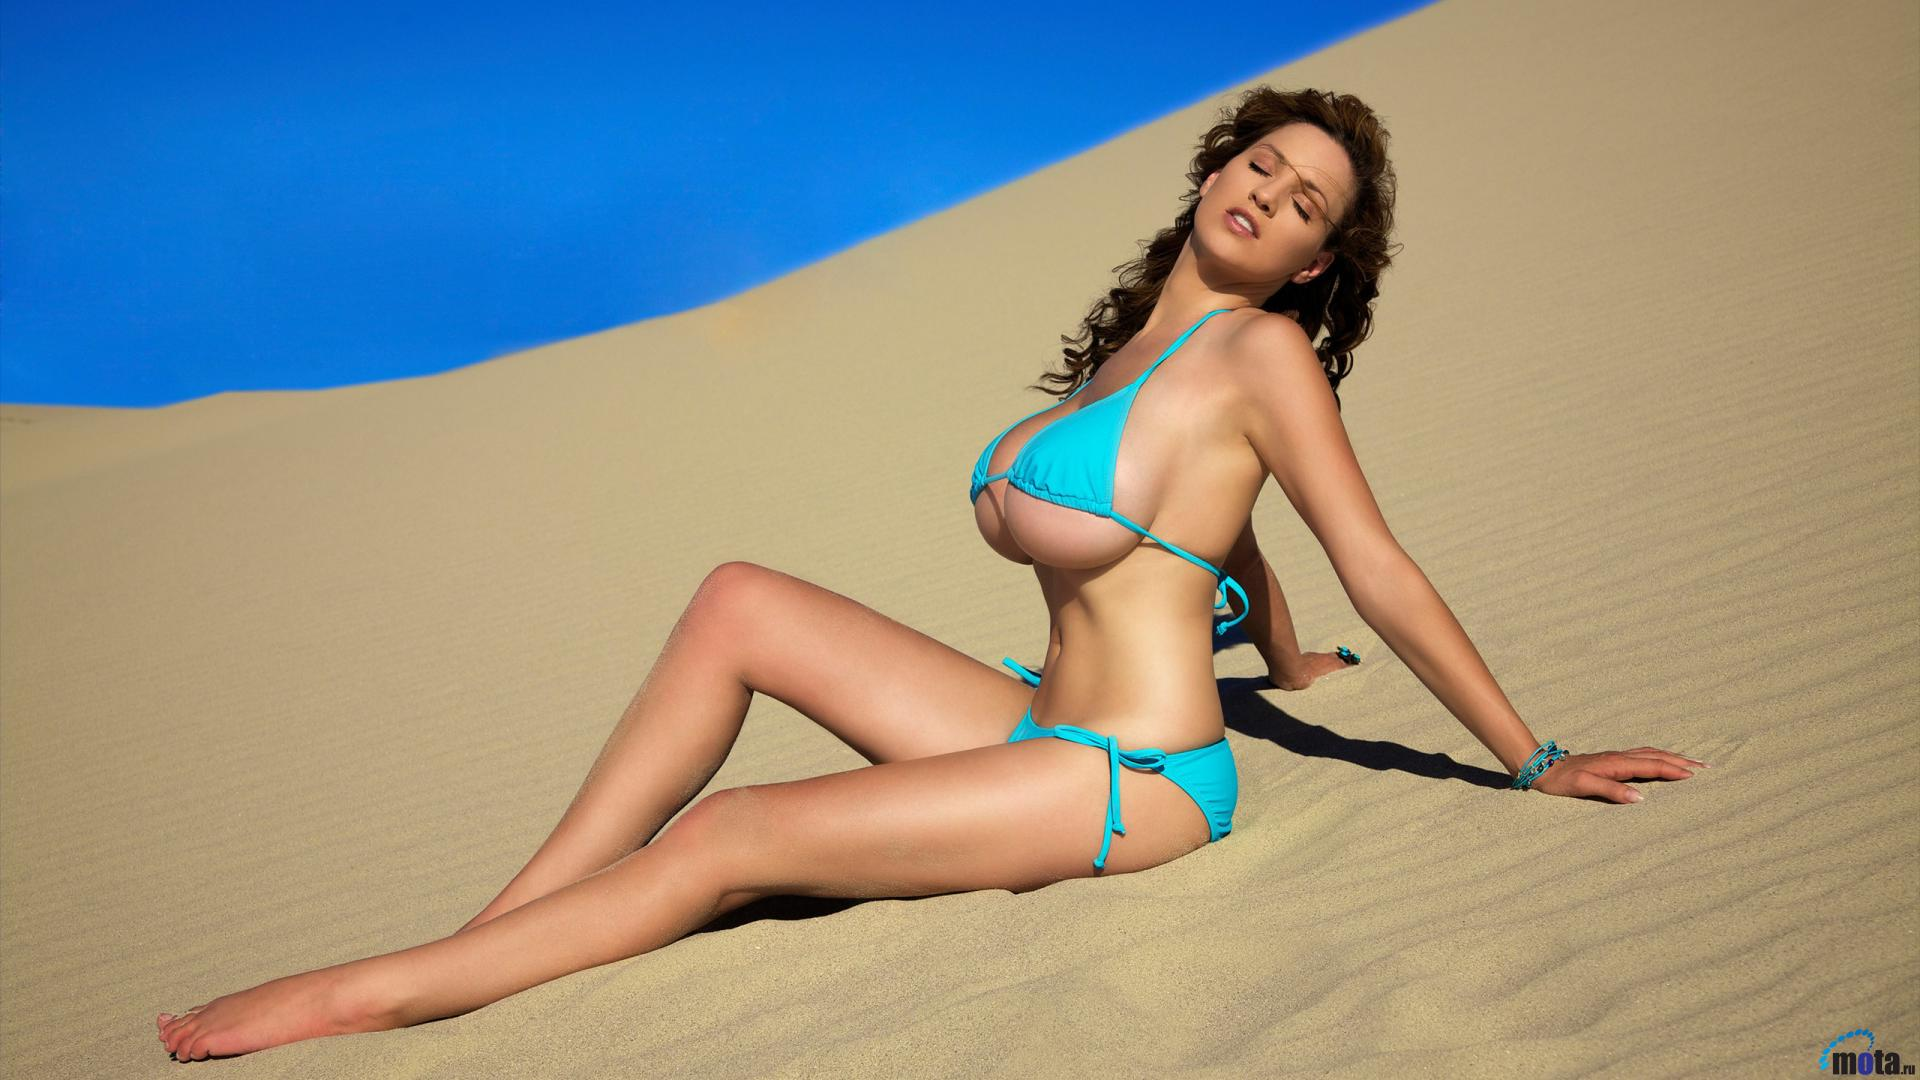 Секс в пустыне онлайн 3 фотография